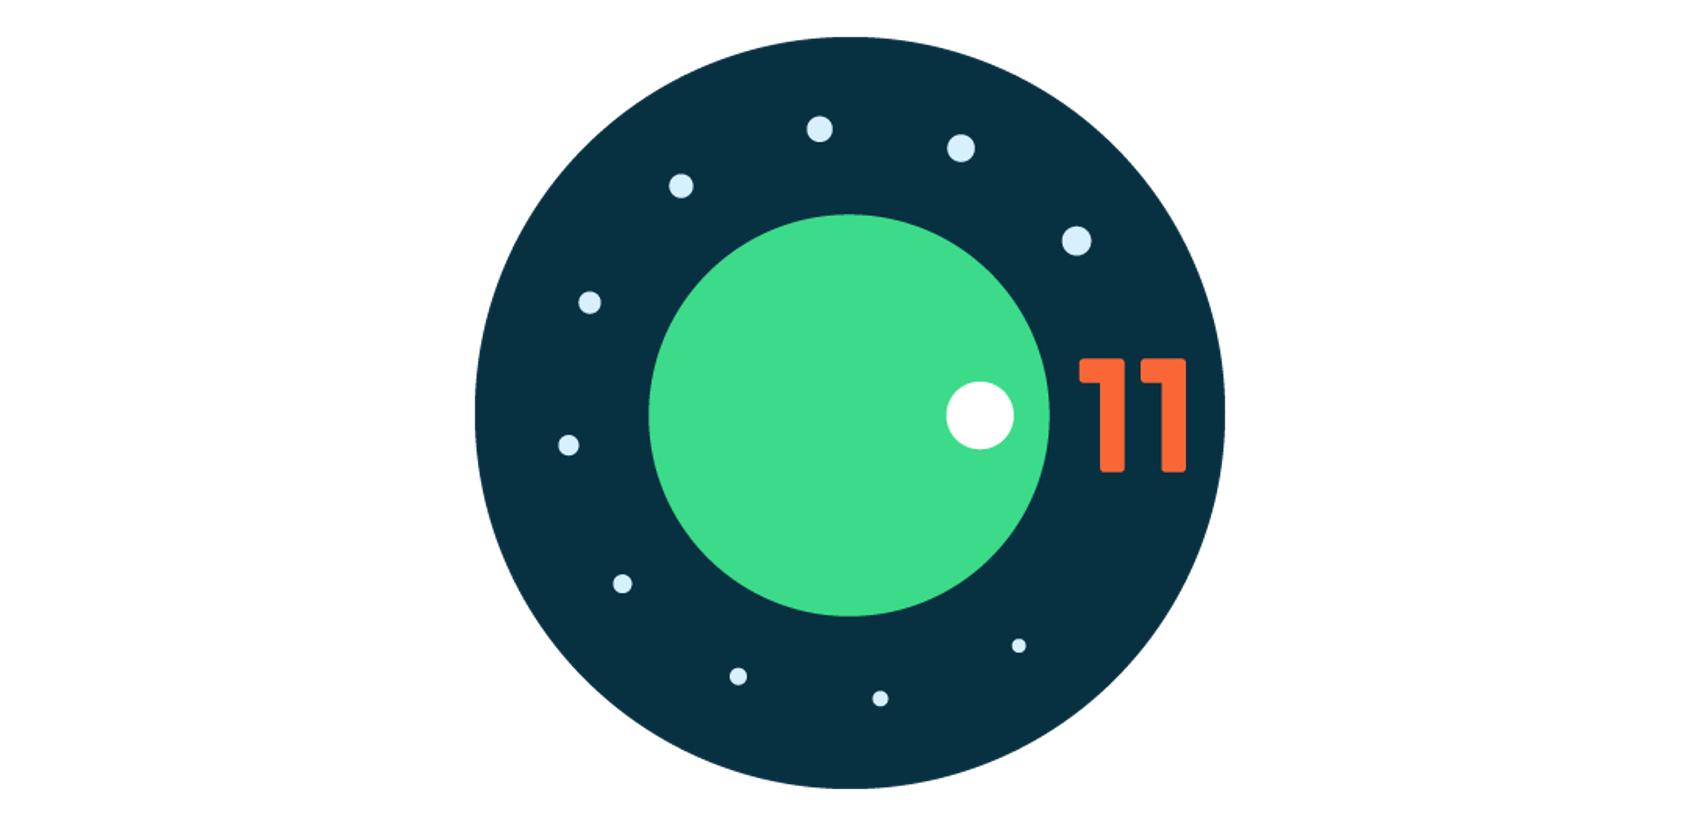 「OnePlus 7T/7」シリーズは12月末までに「Android 11」への安定版アップデートが提供予定か